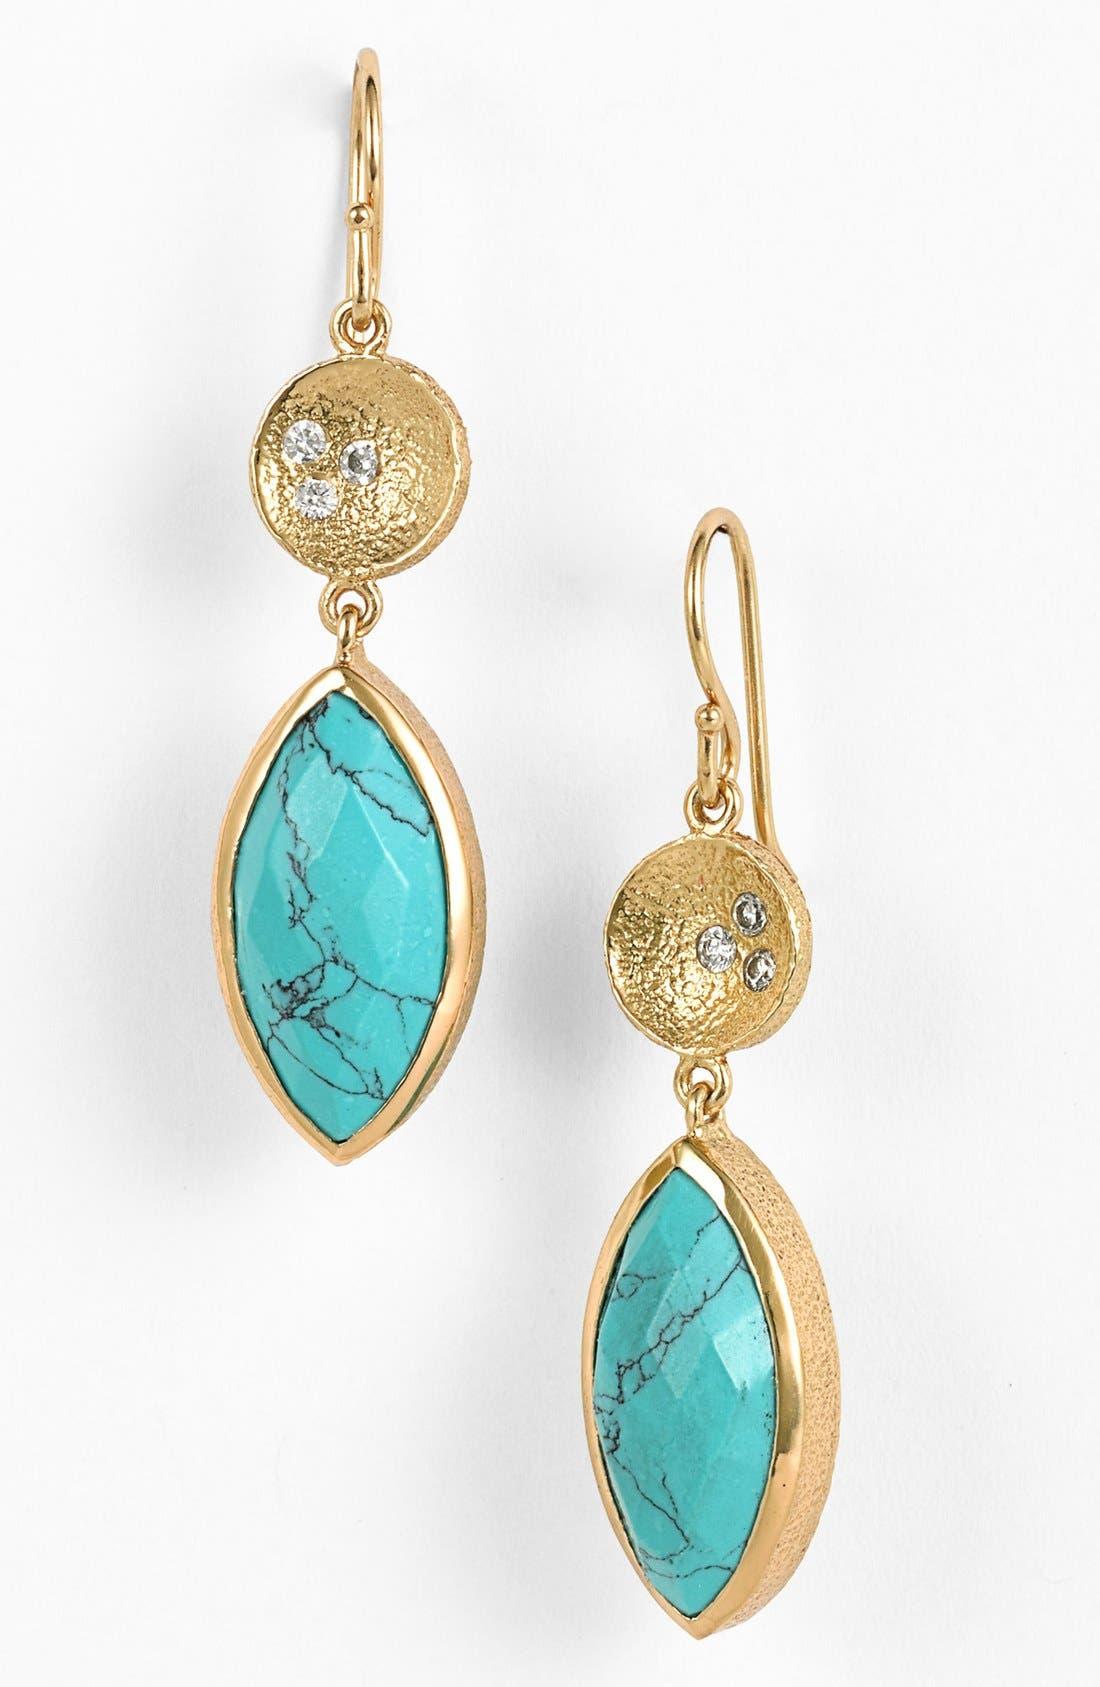 Main Image - Melinda Maria 'Dory' Drop Earrings